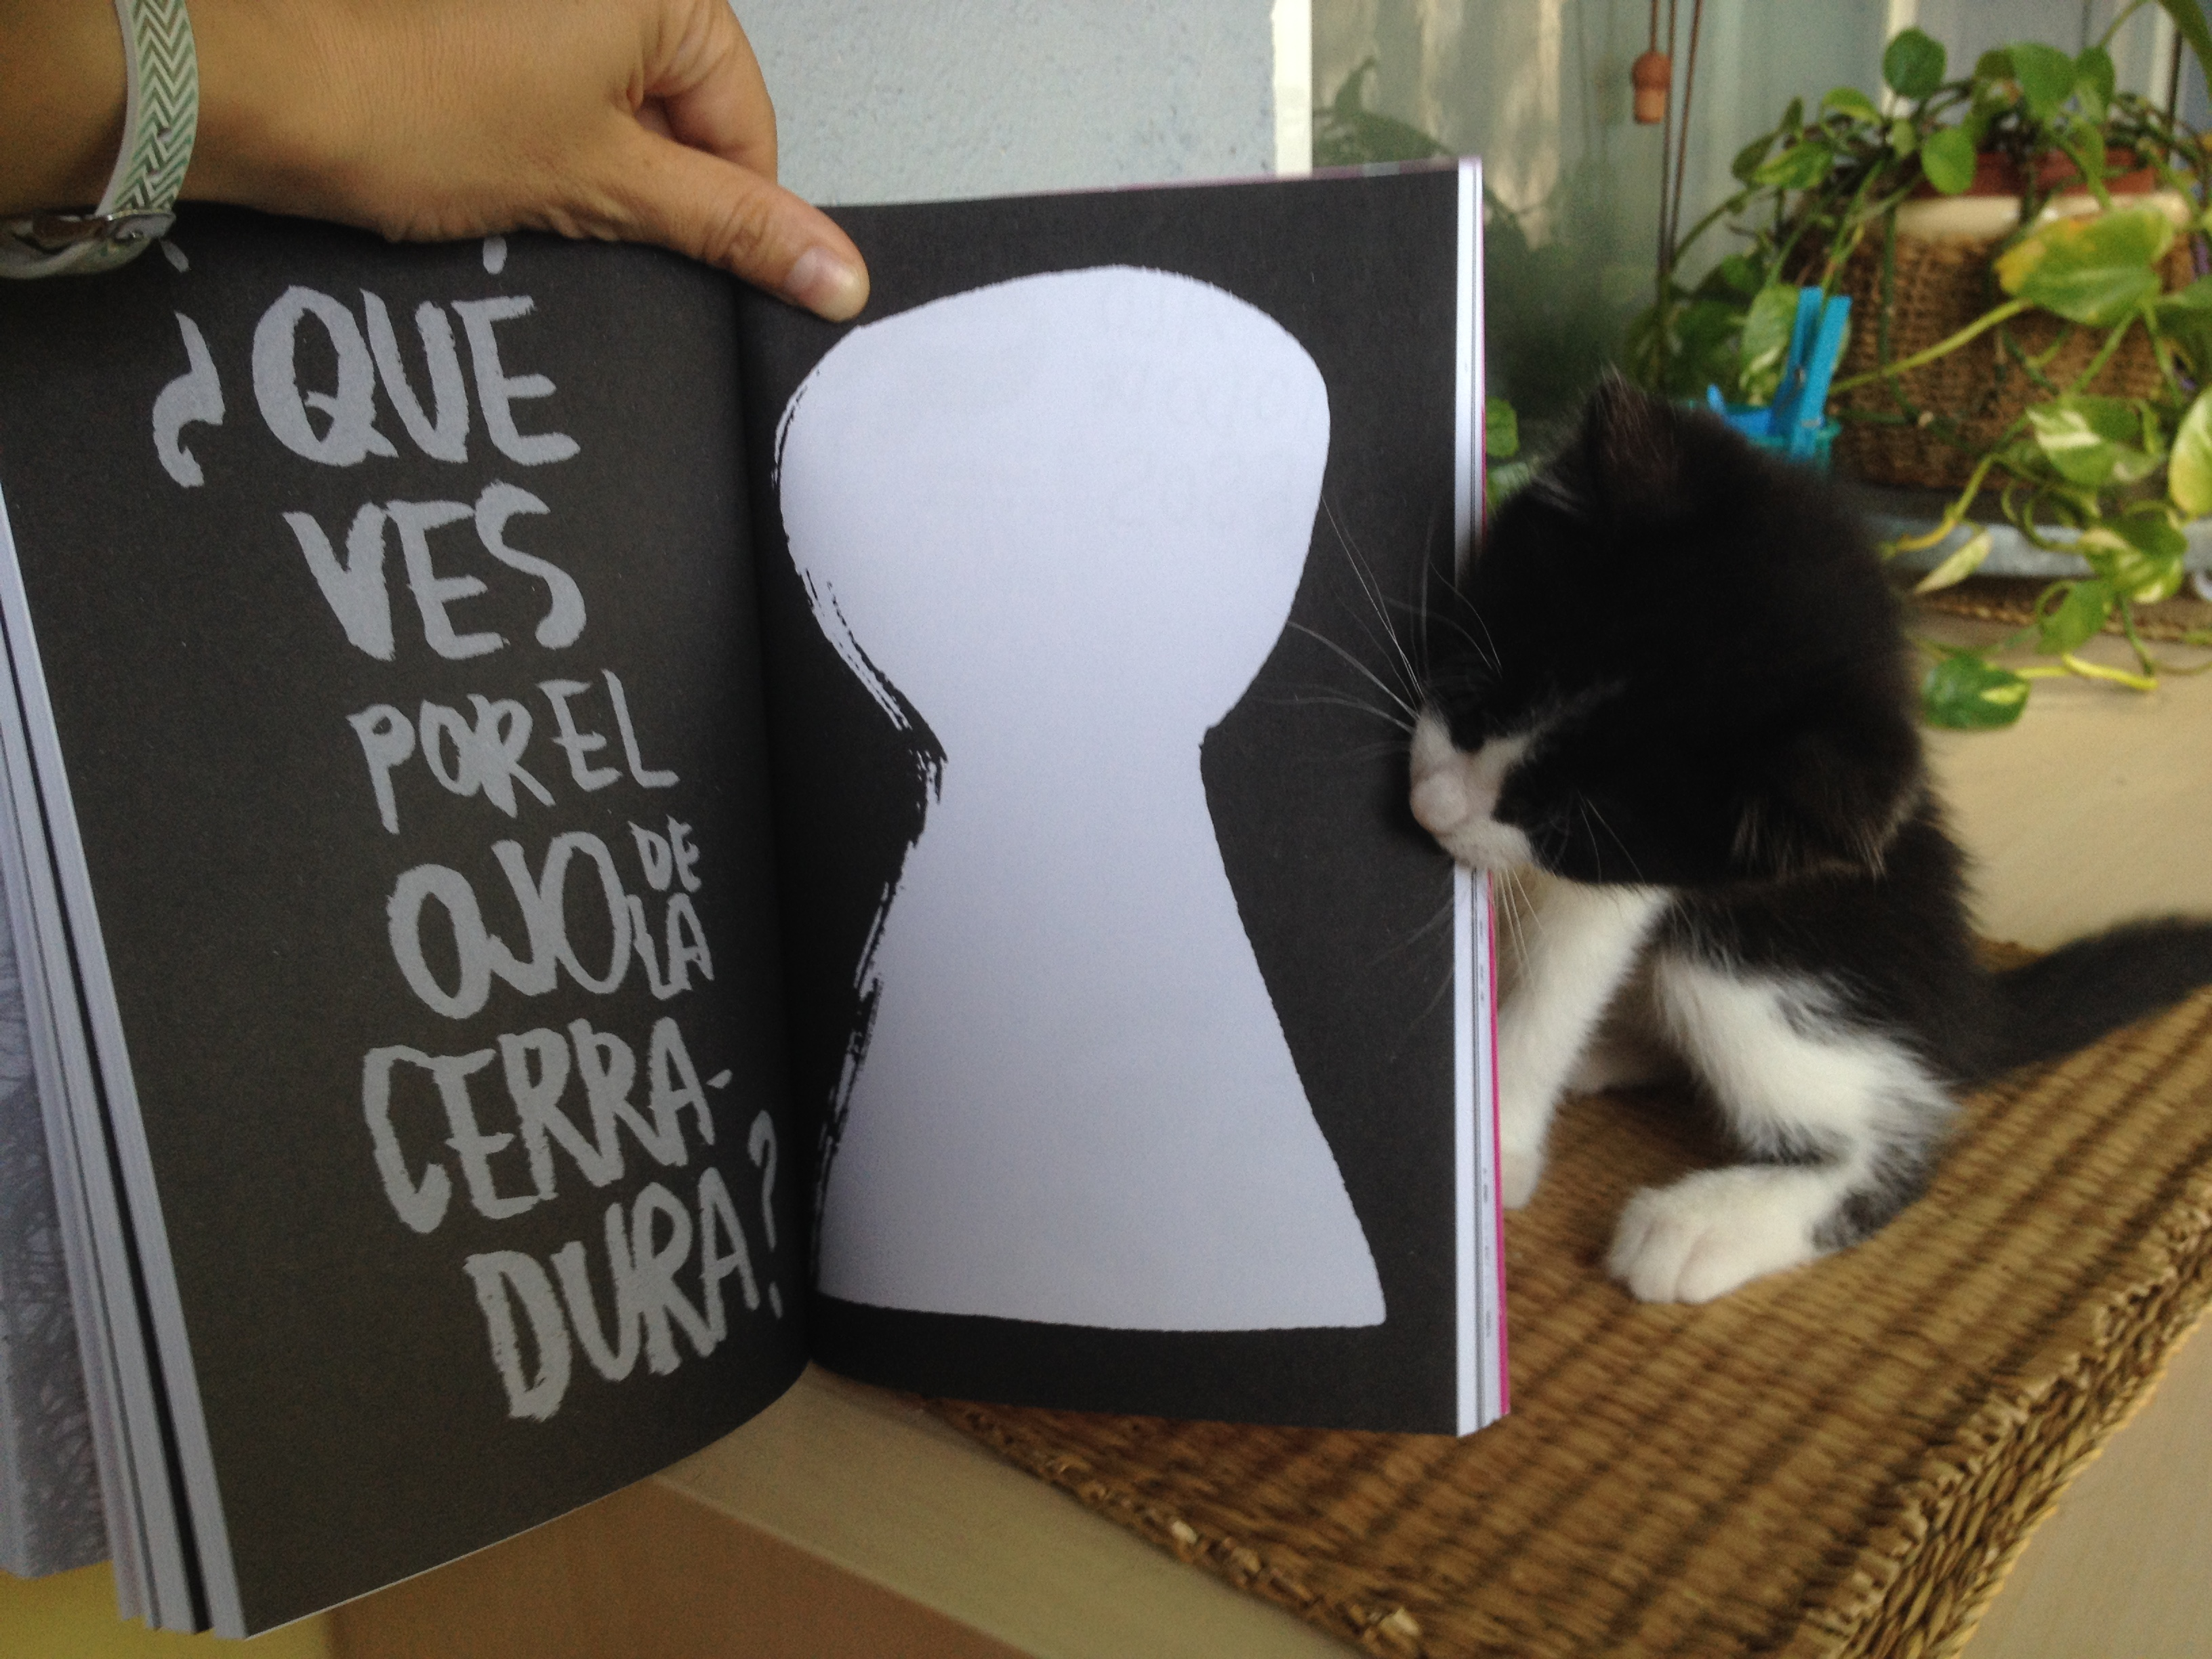 Libro creativo Top Secret. A mi gata también le gusta.